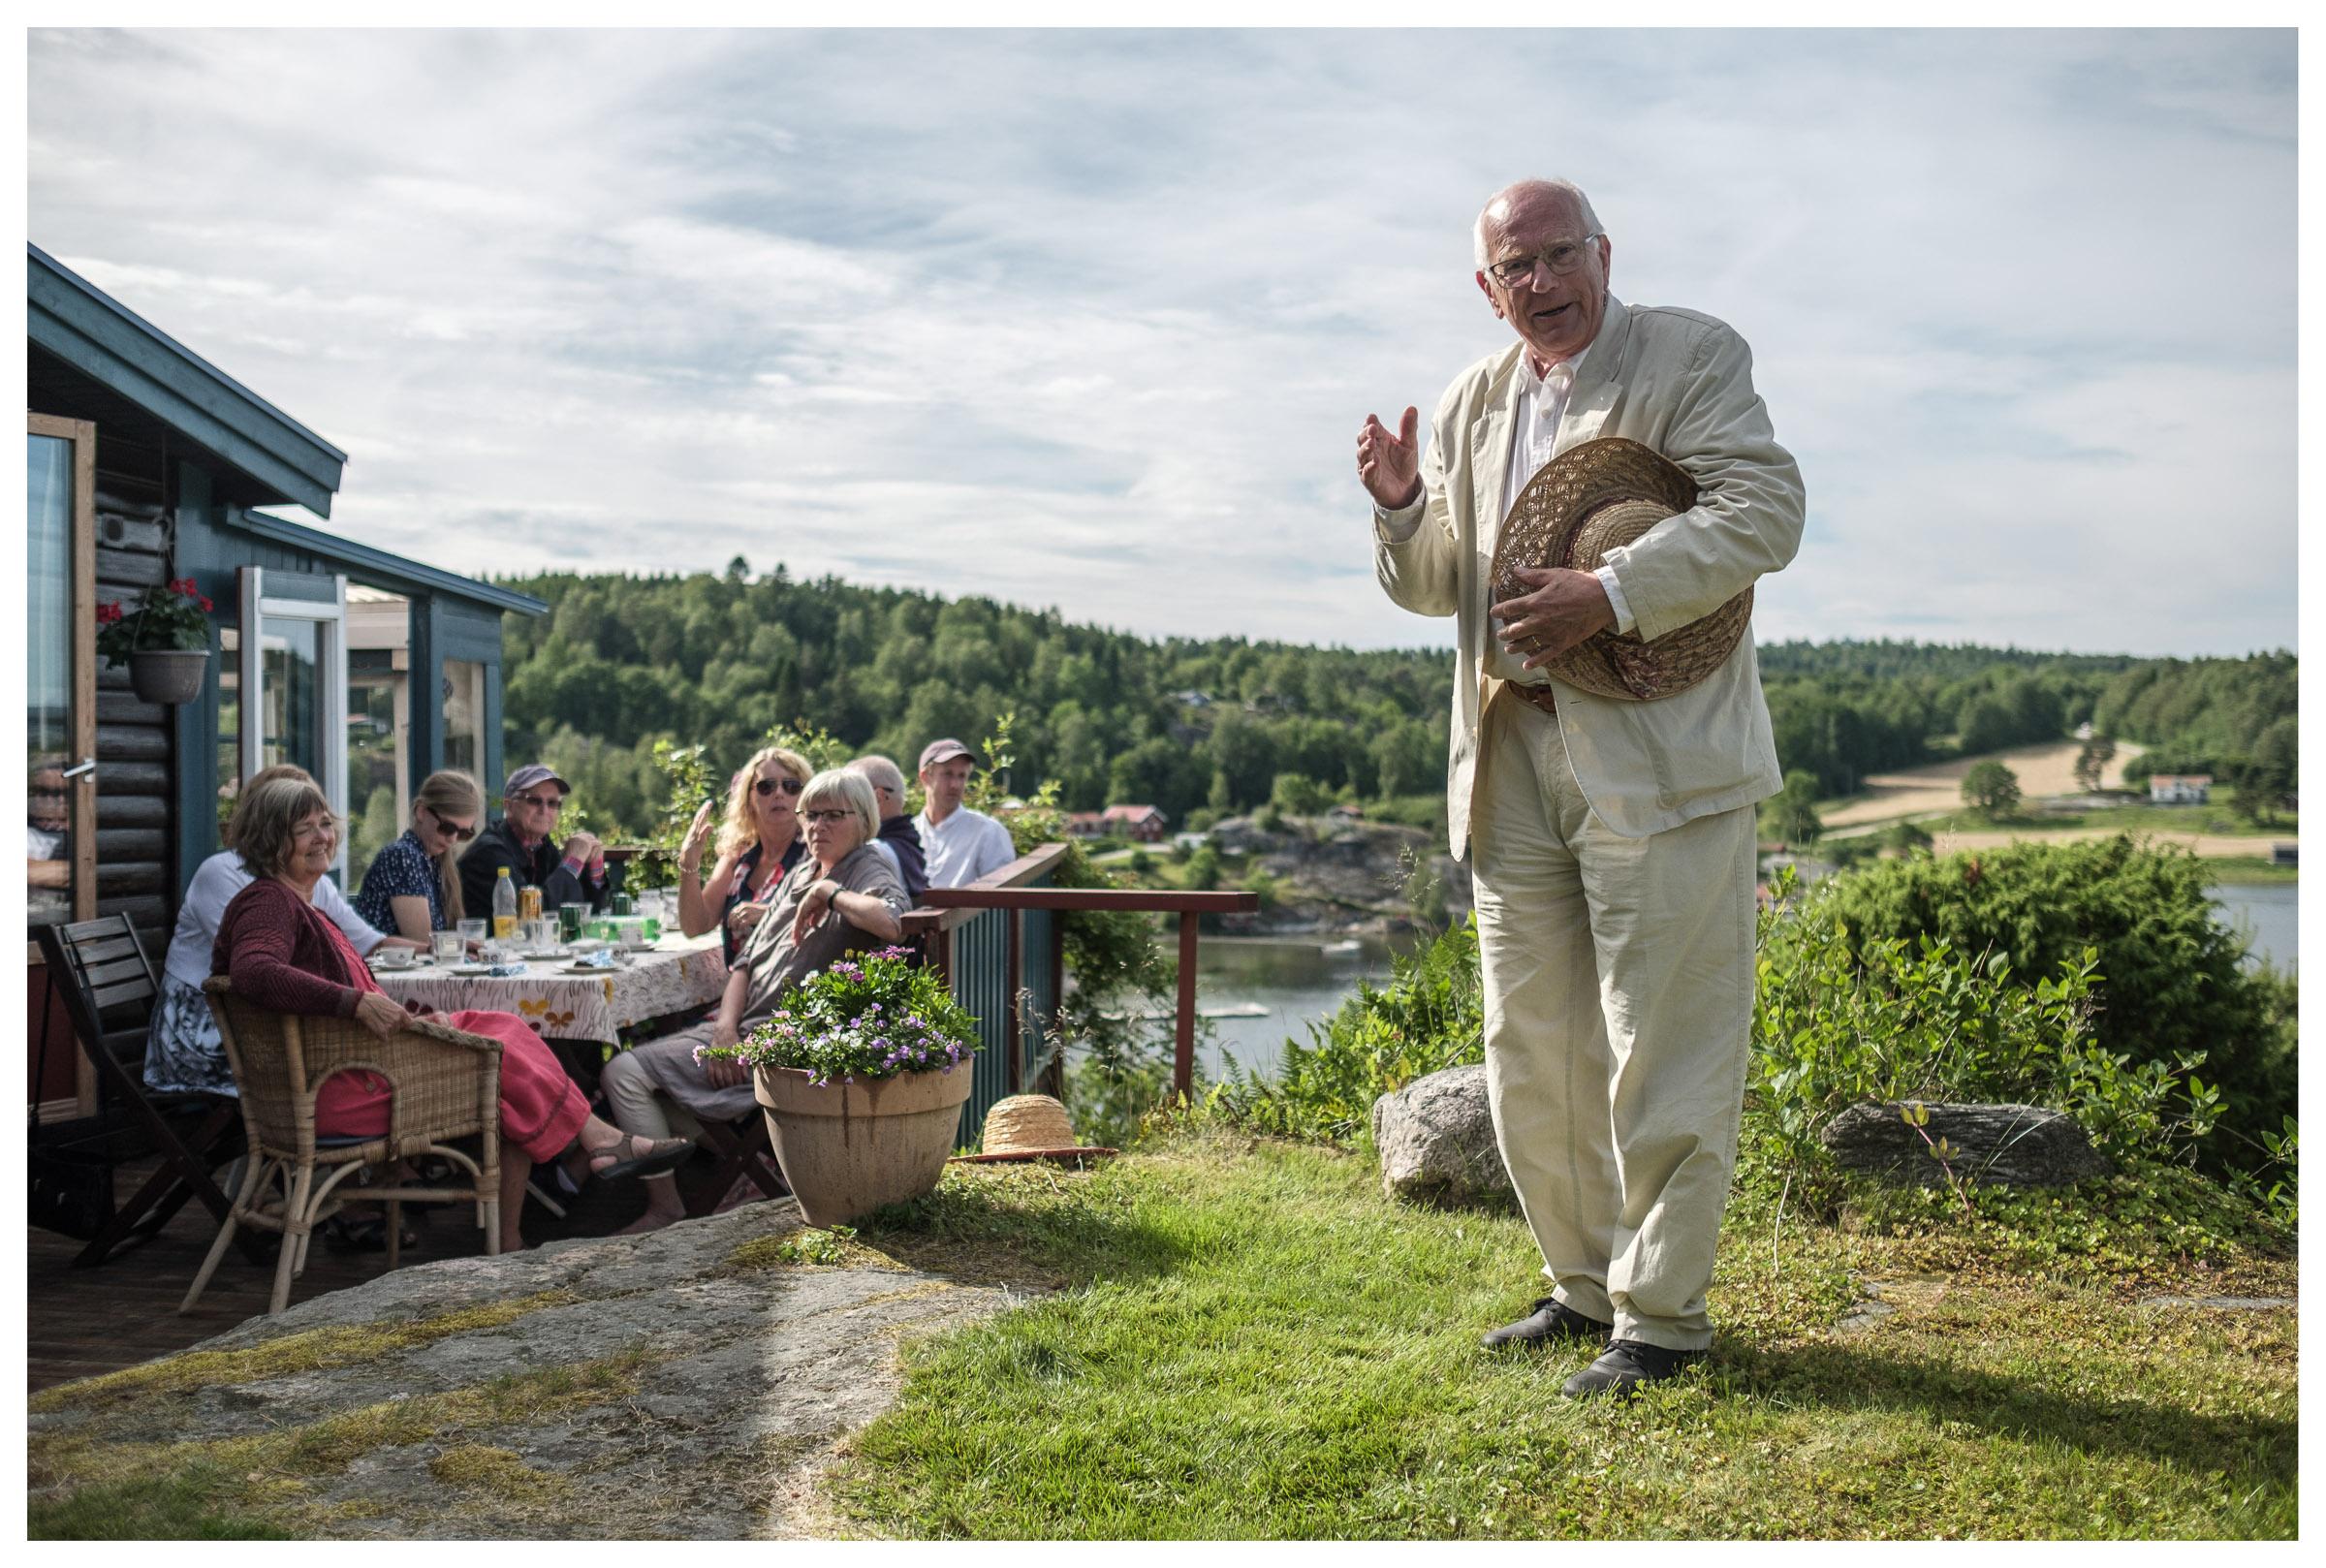 Thorbjörnsson family reunion at Slussen